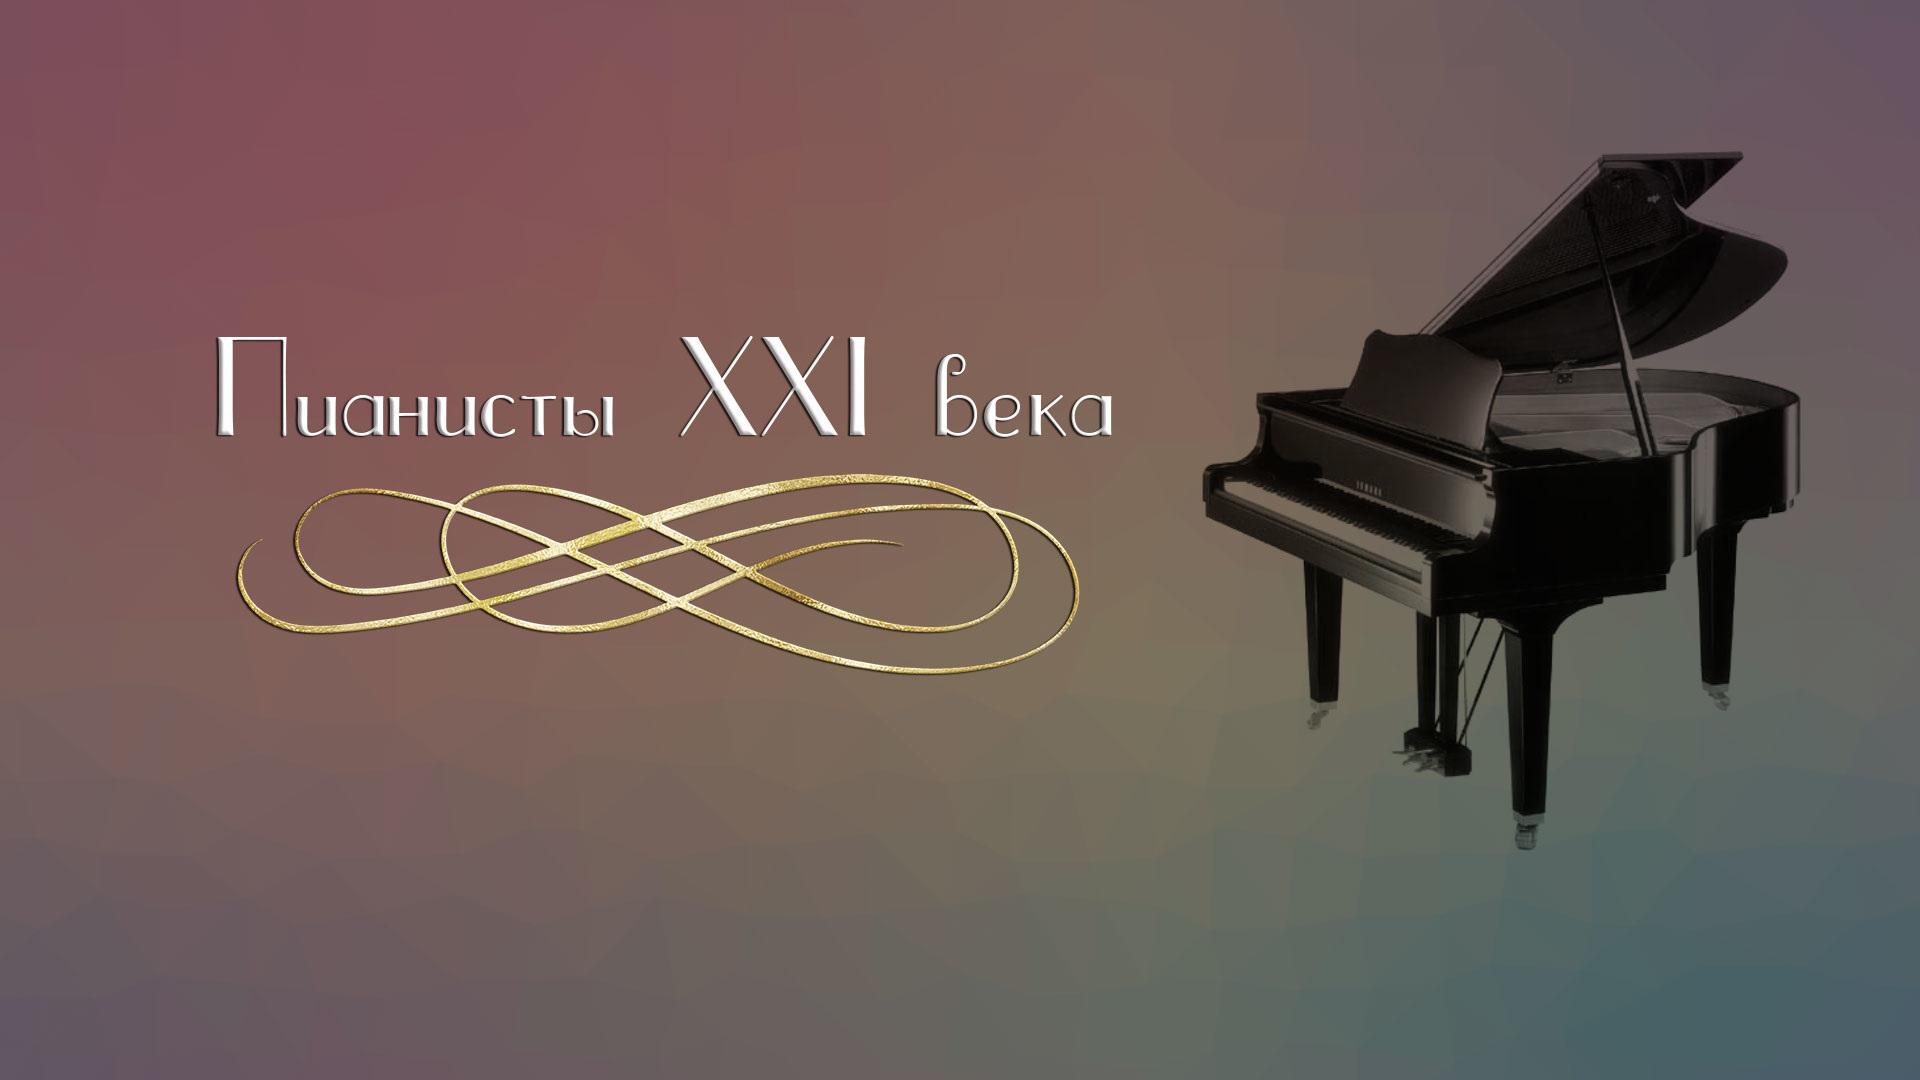 Пианисты XXI века